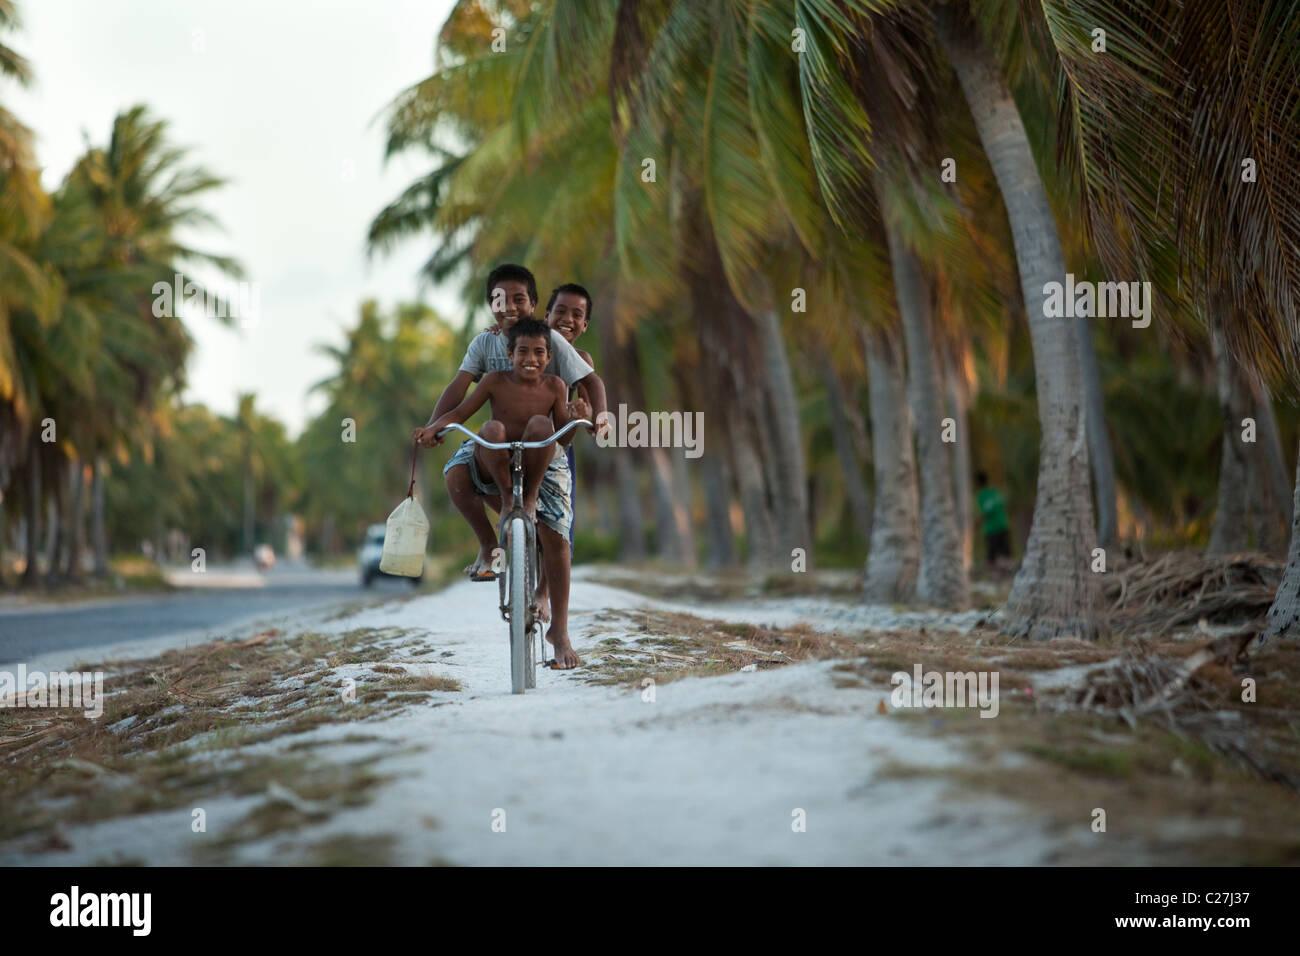 Kiritimati, Kiribati, Christmas Island, three island boys having fun all riding one bike - Stock Image